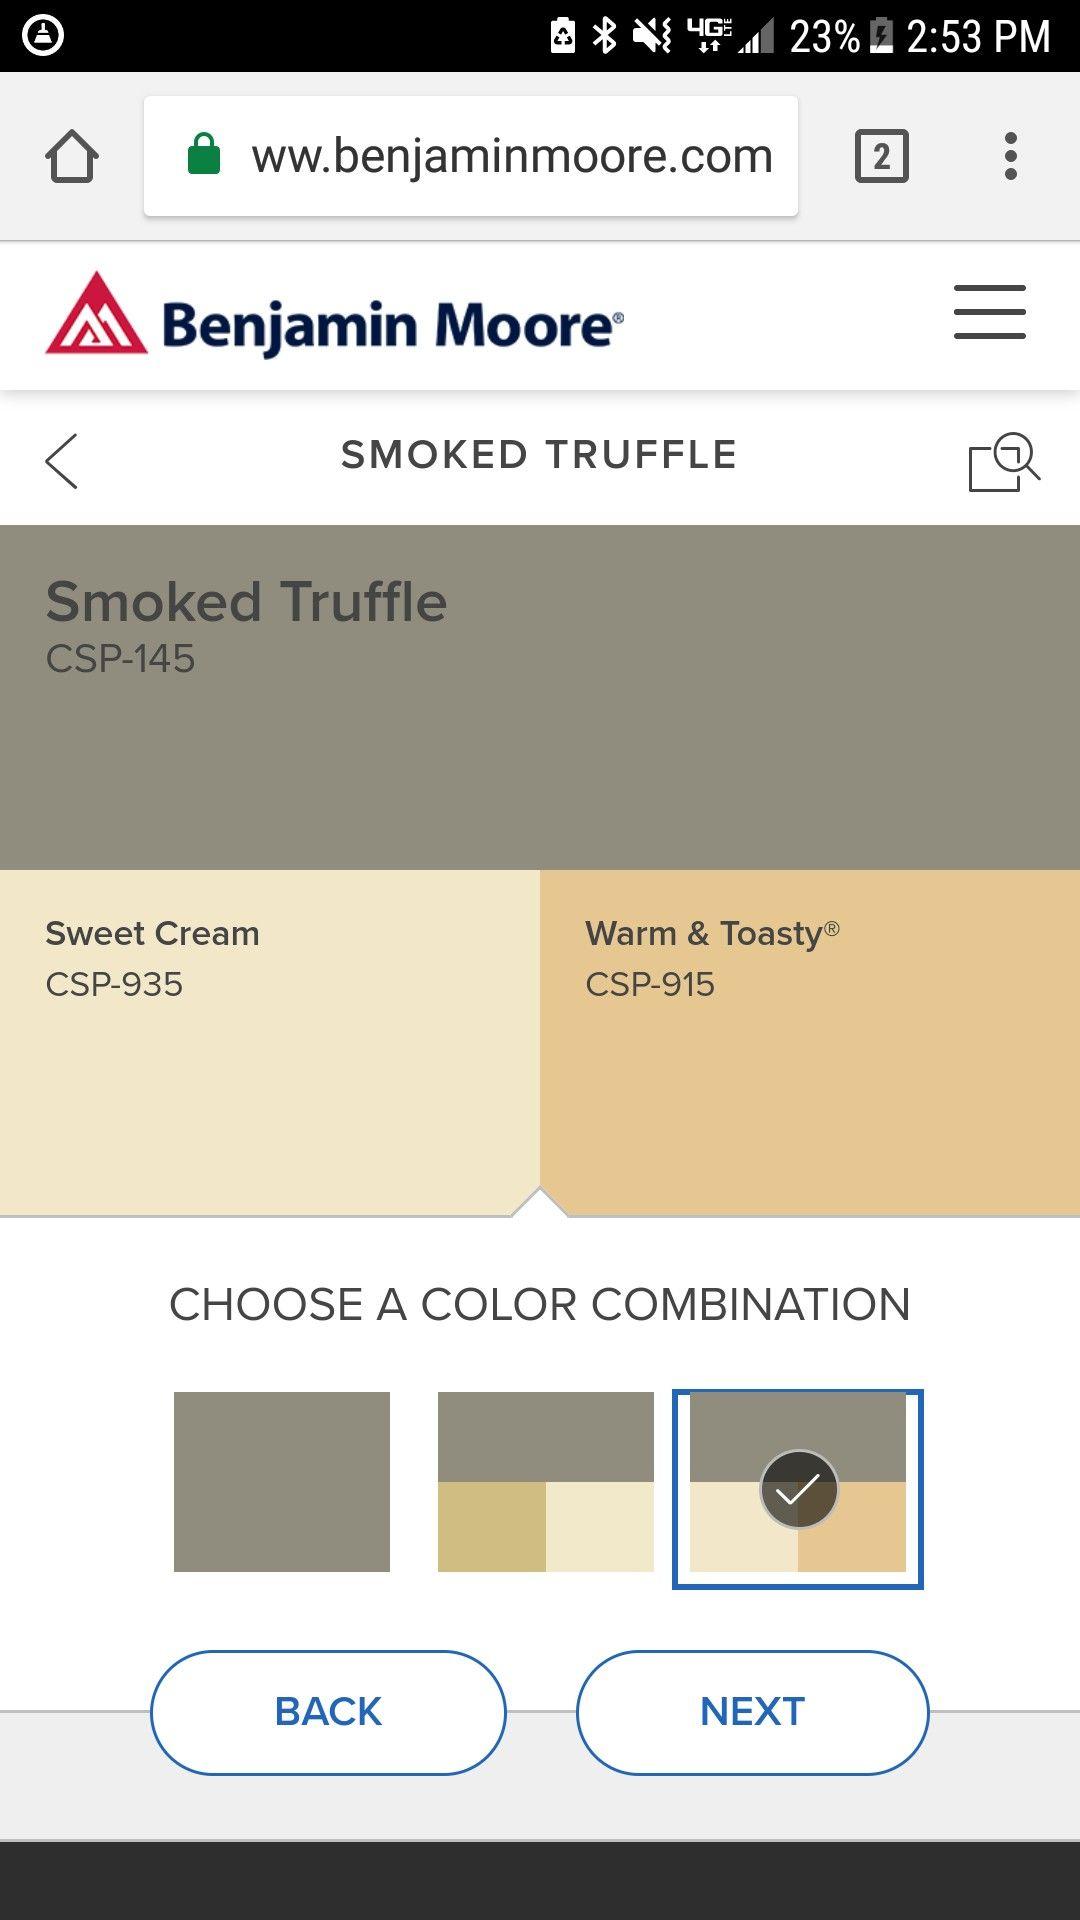 Benjamin Moore Smoked Truffle Benjamin Moore Smoke Truffles Color Schemes